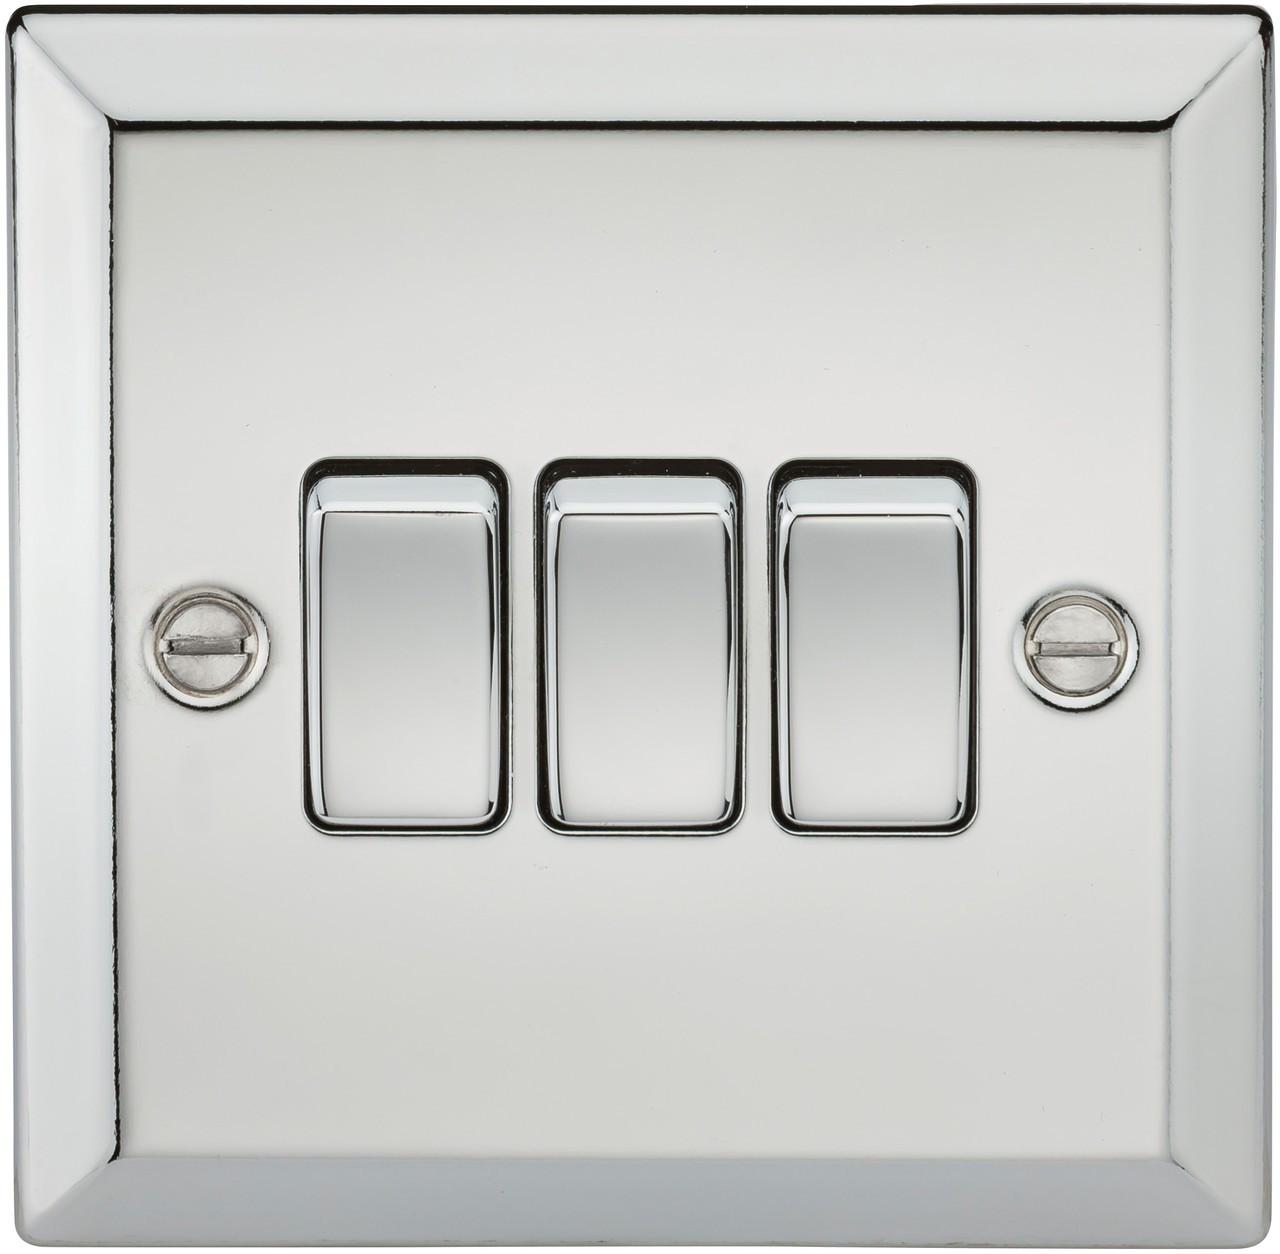 10A 3G 2 Way Plate Switch - Bevelled Edge Polished Chrome (DFL1CV4PC)